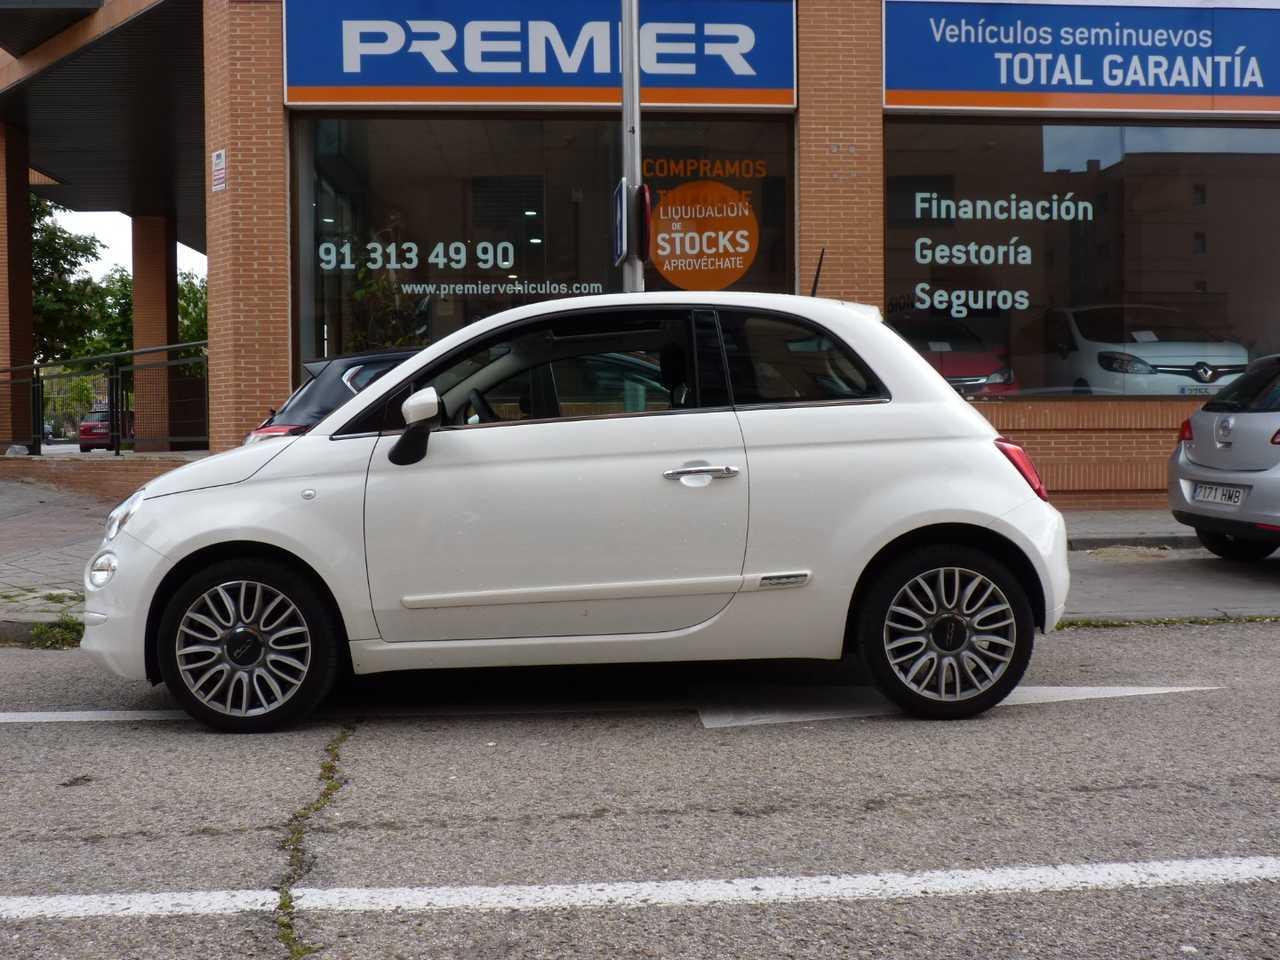 Fiat 500 1.2 69 CV  HIBRIDO GLP/GASOLINA LOUNGE  - Foto 1